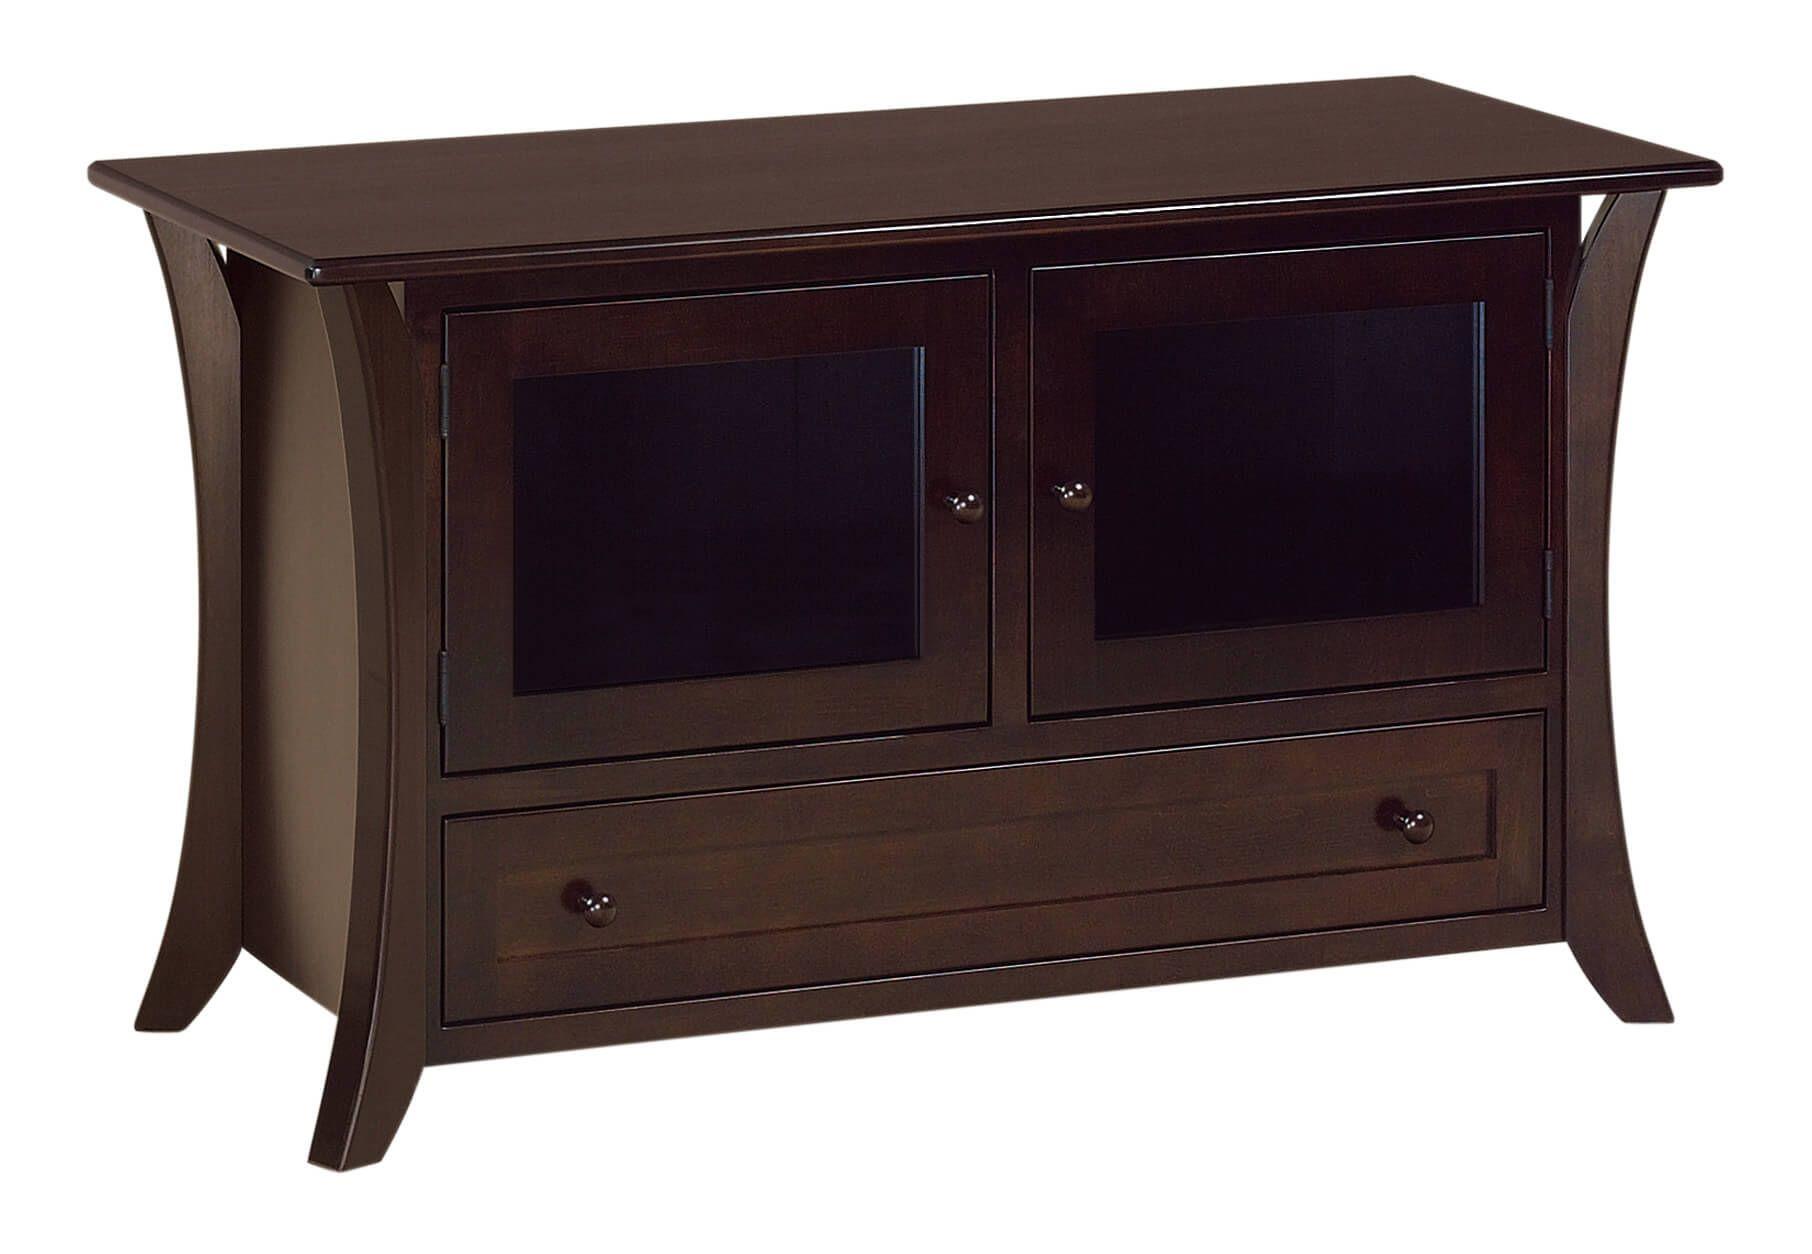 Rockefeller 2-Door Media Stand - Countryside Amish Furniture